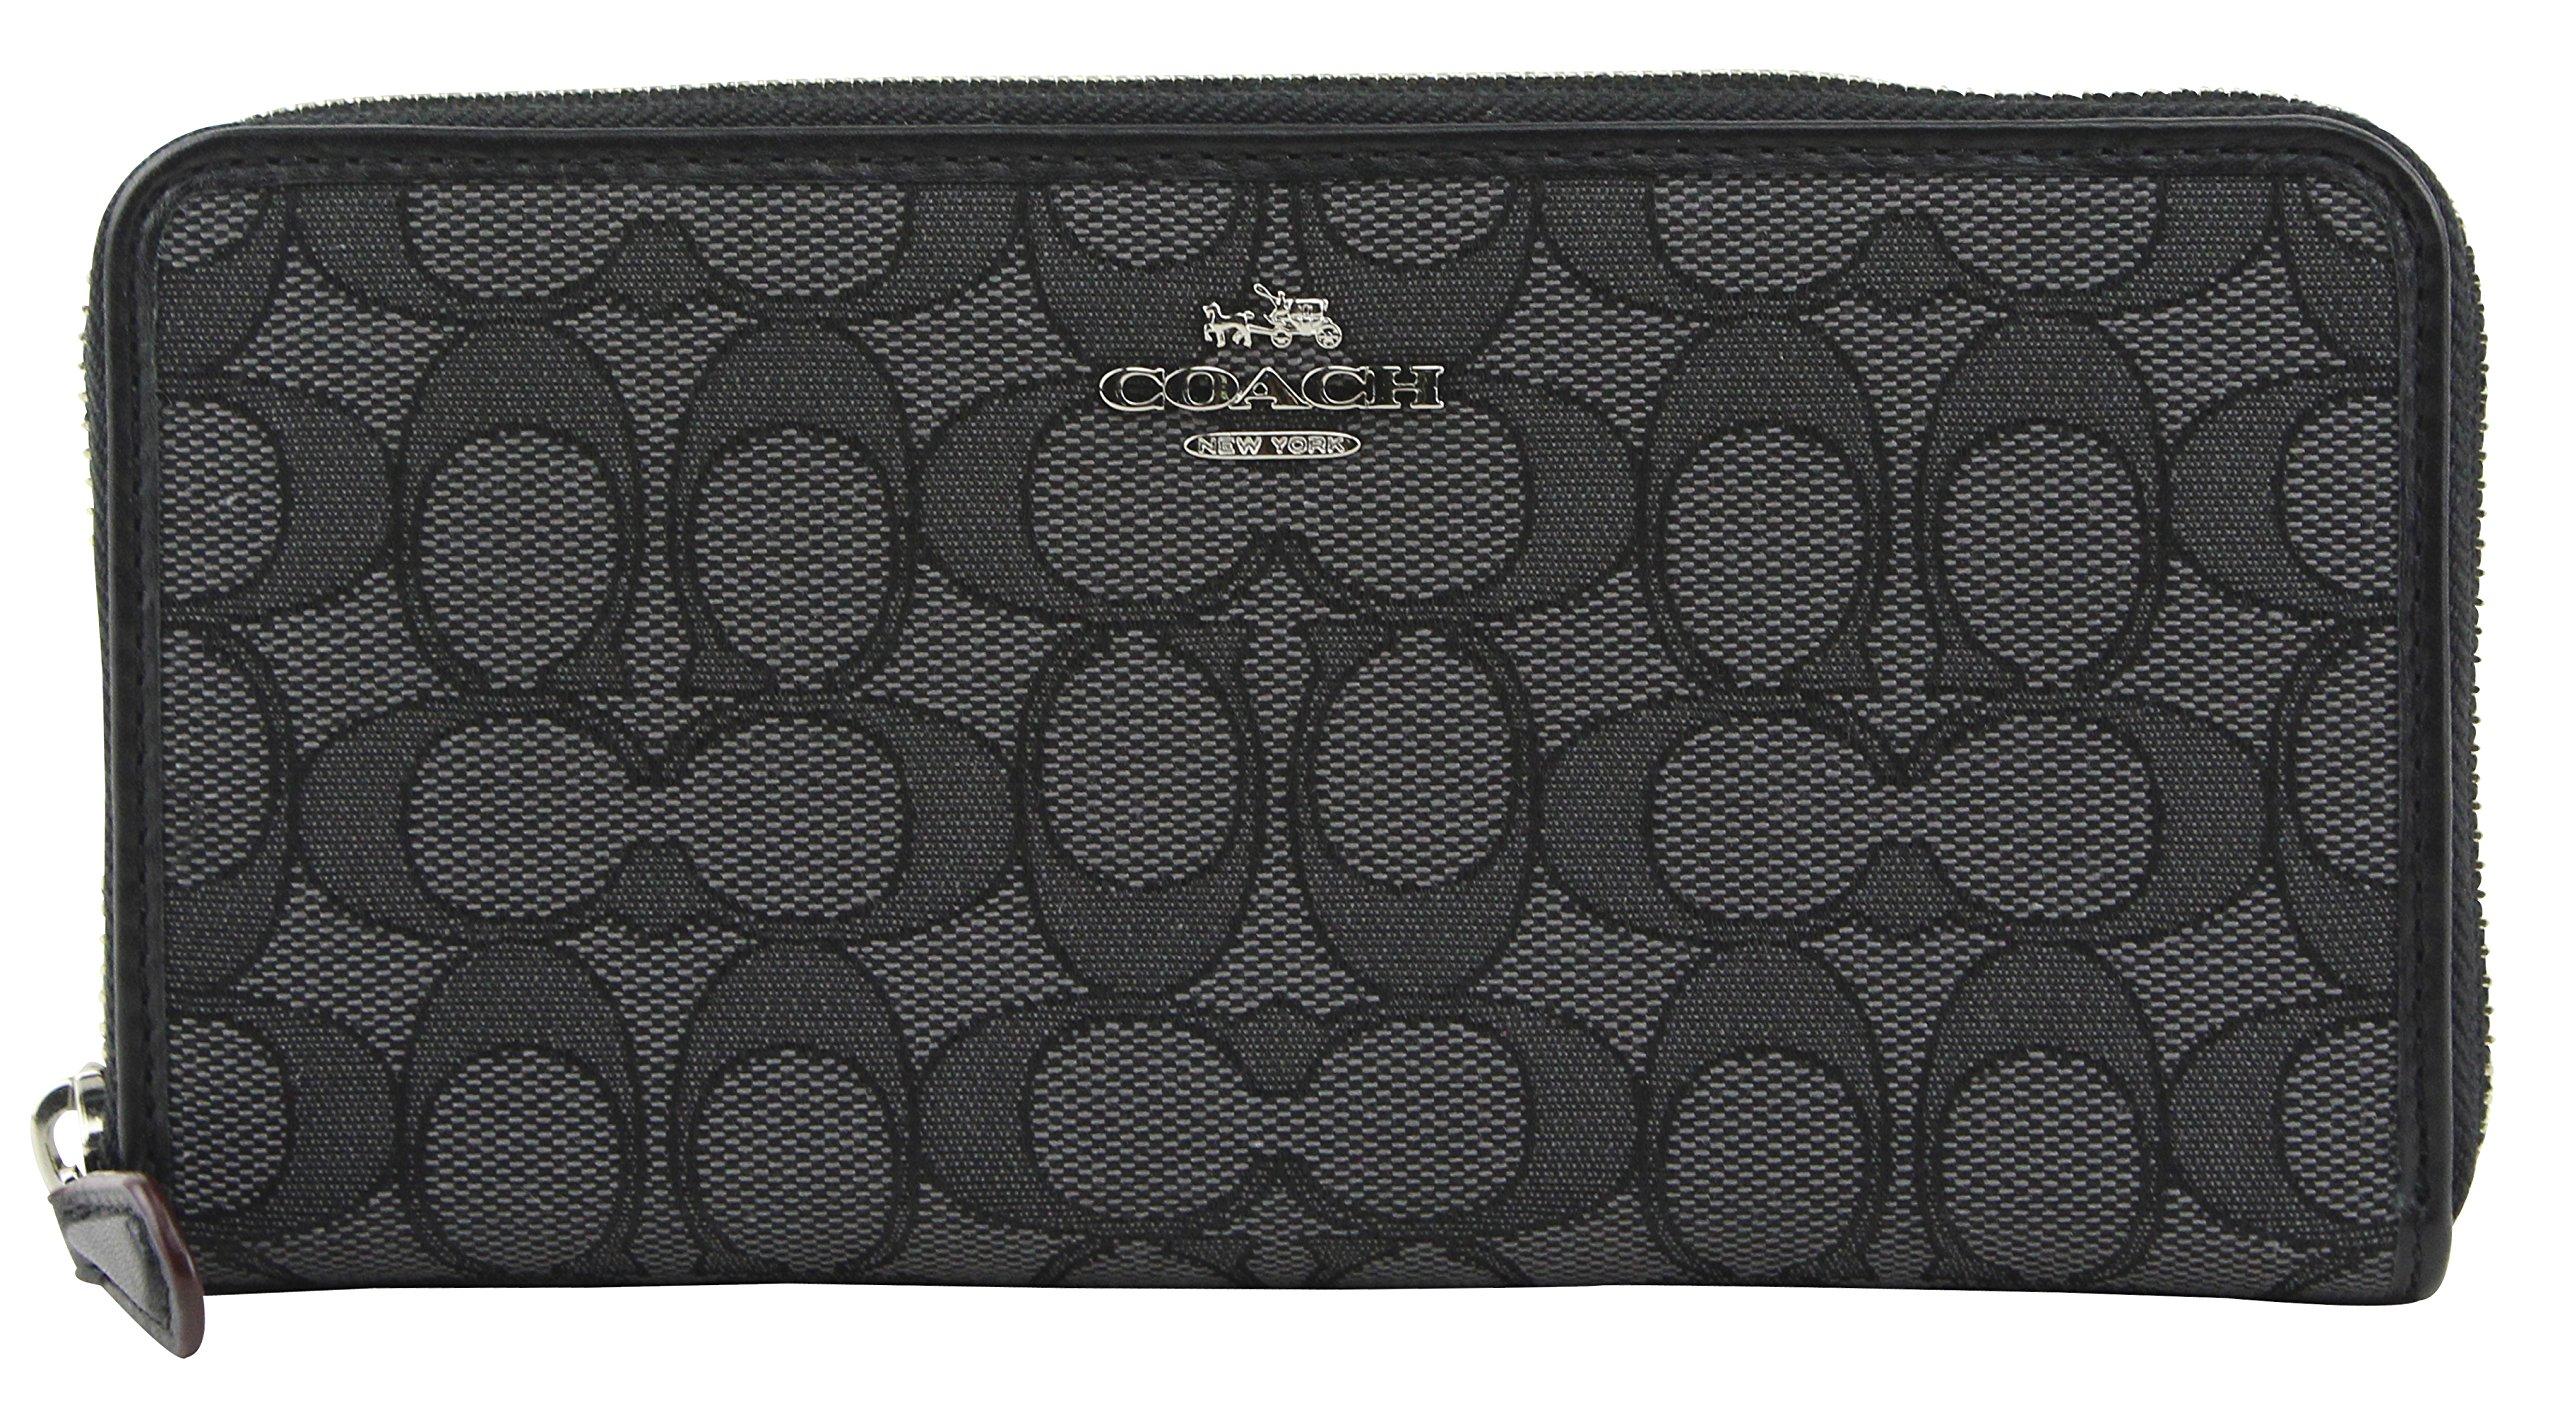 Coach Accordion Zip Wallet in Outline Signature (Black Smoke/Black) - F54633 SVDK6 by Coach